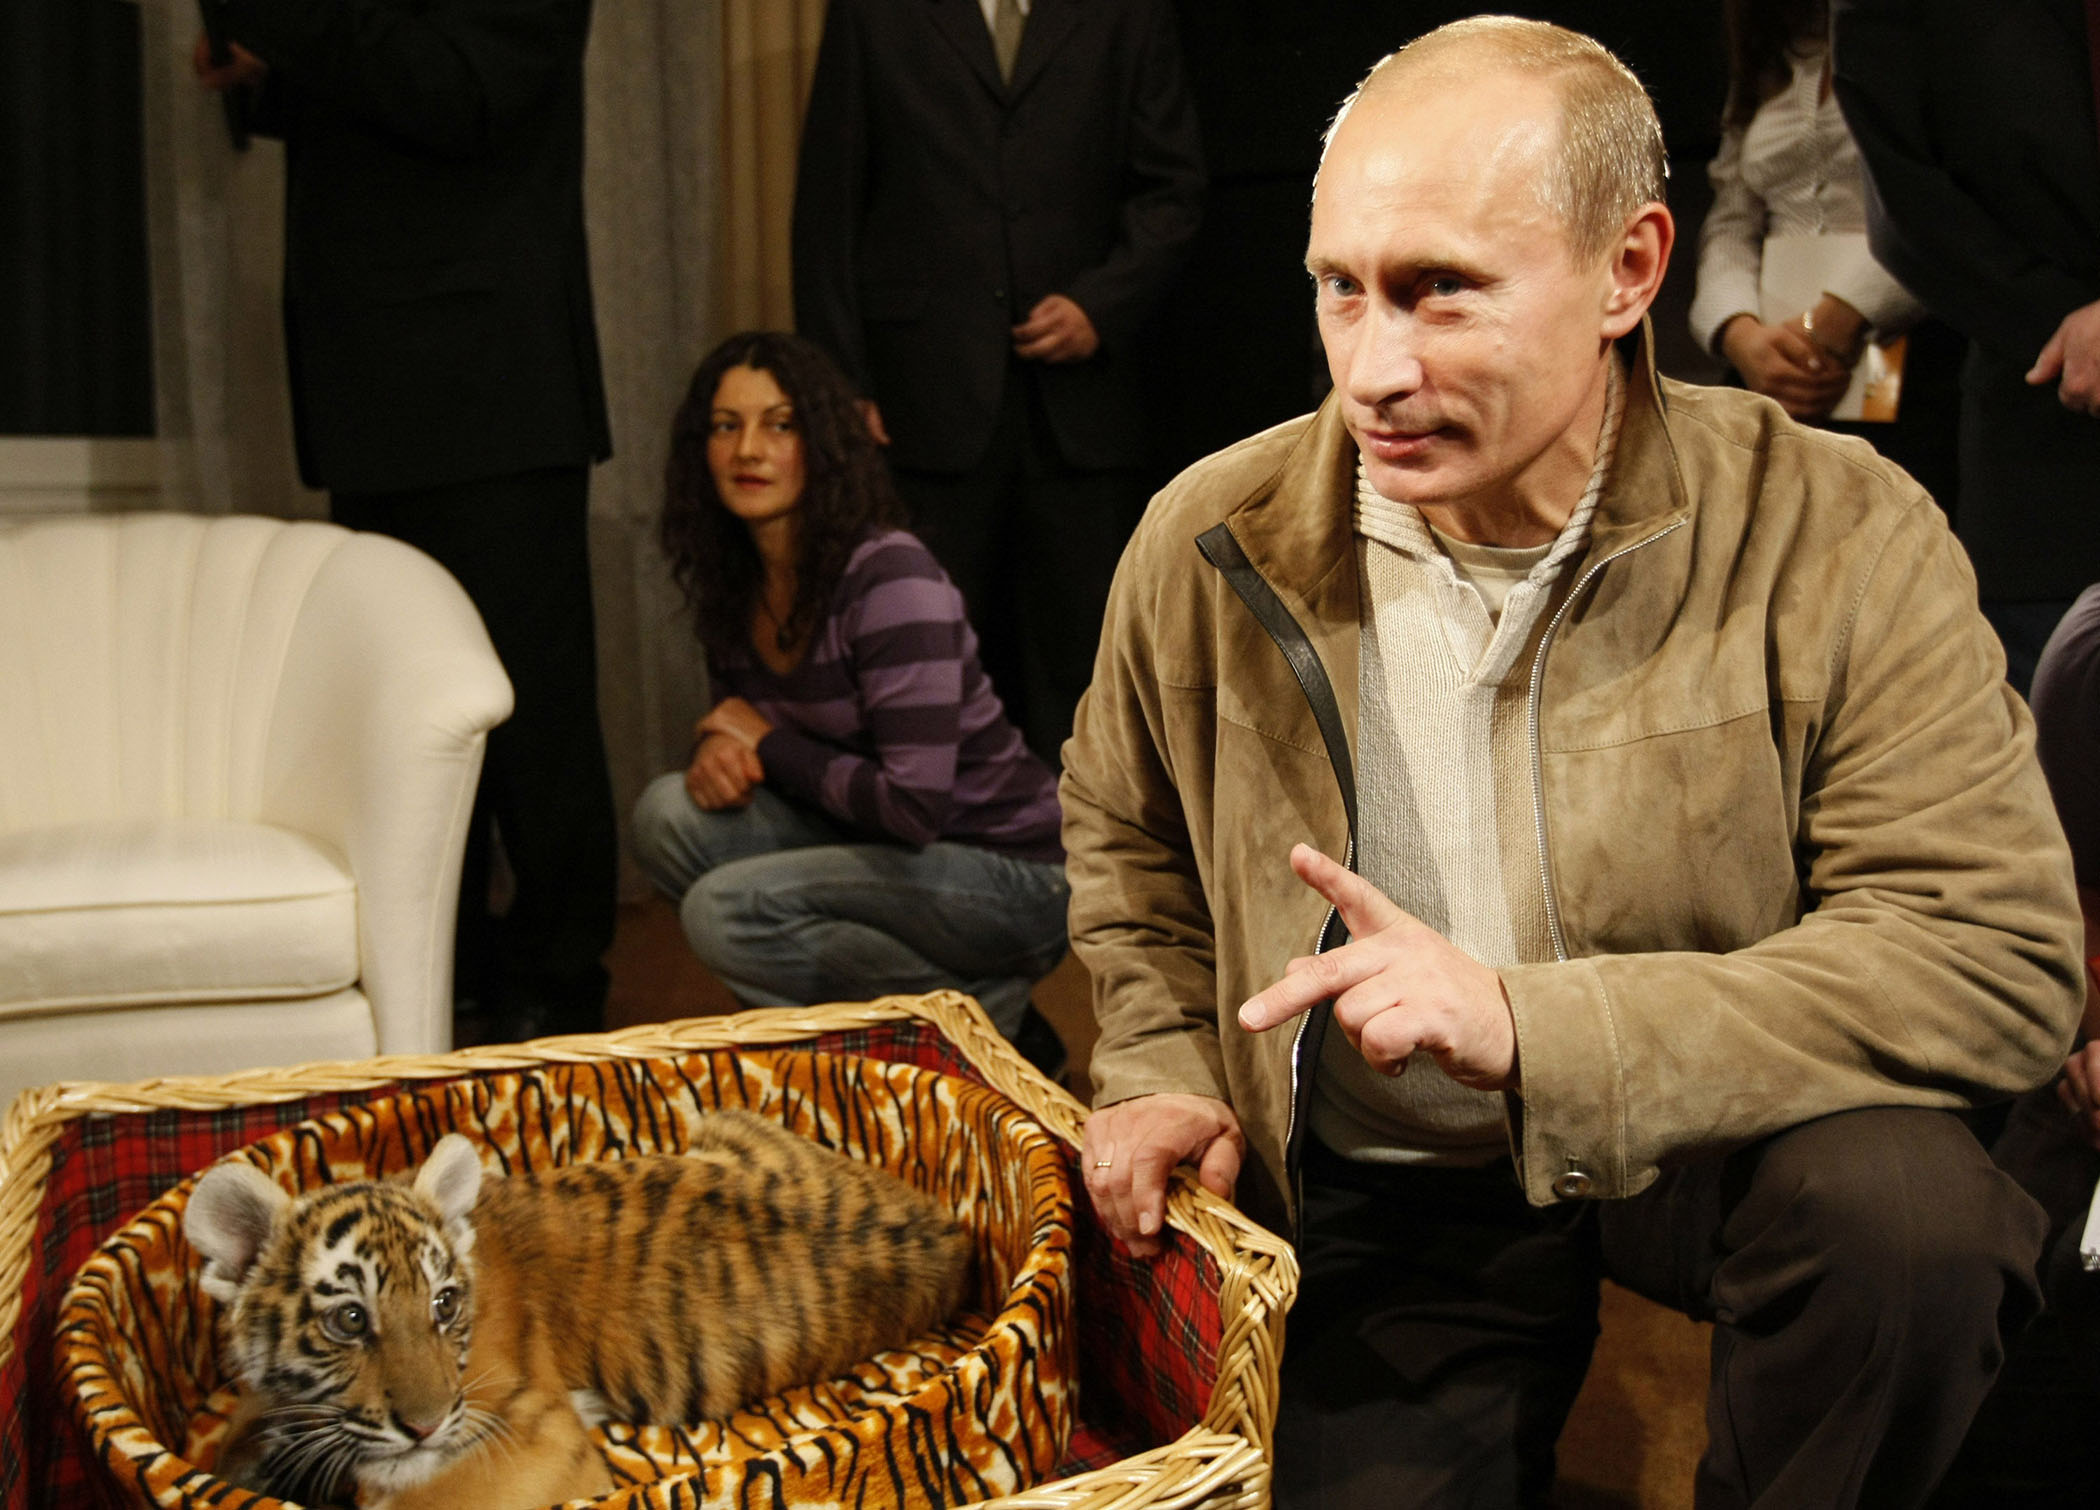 Putin Recieves Baby Tiger for Birthday